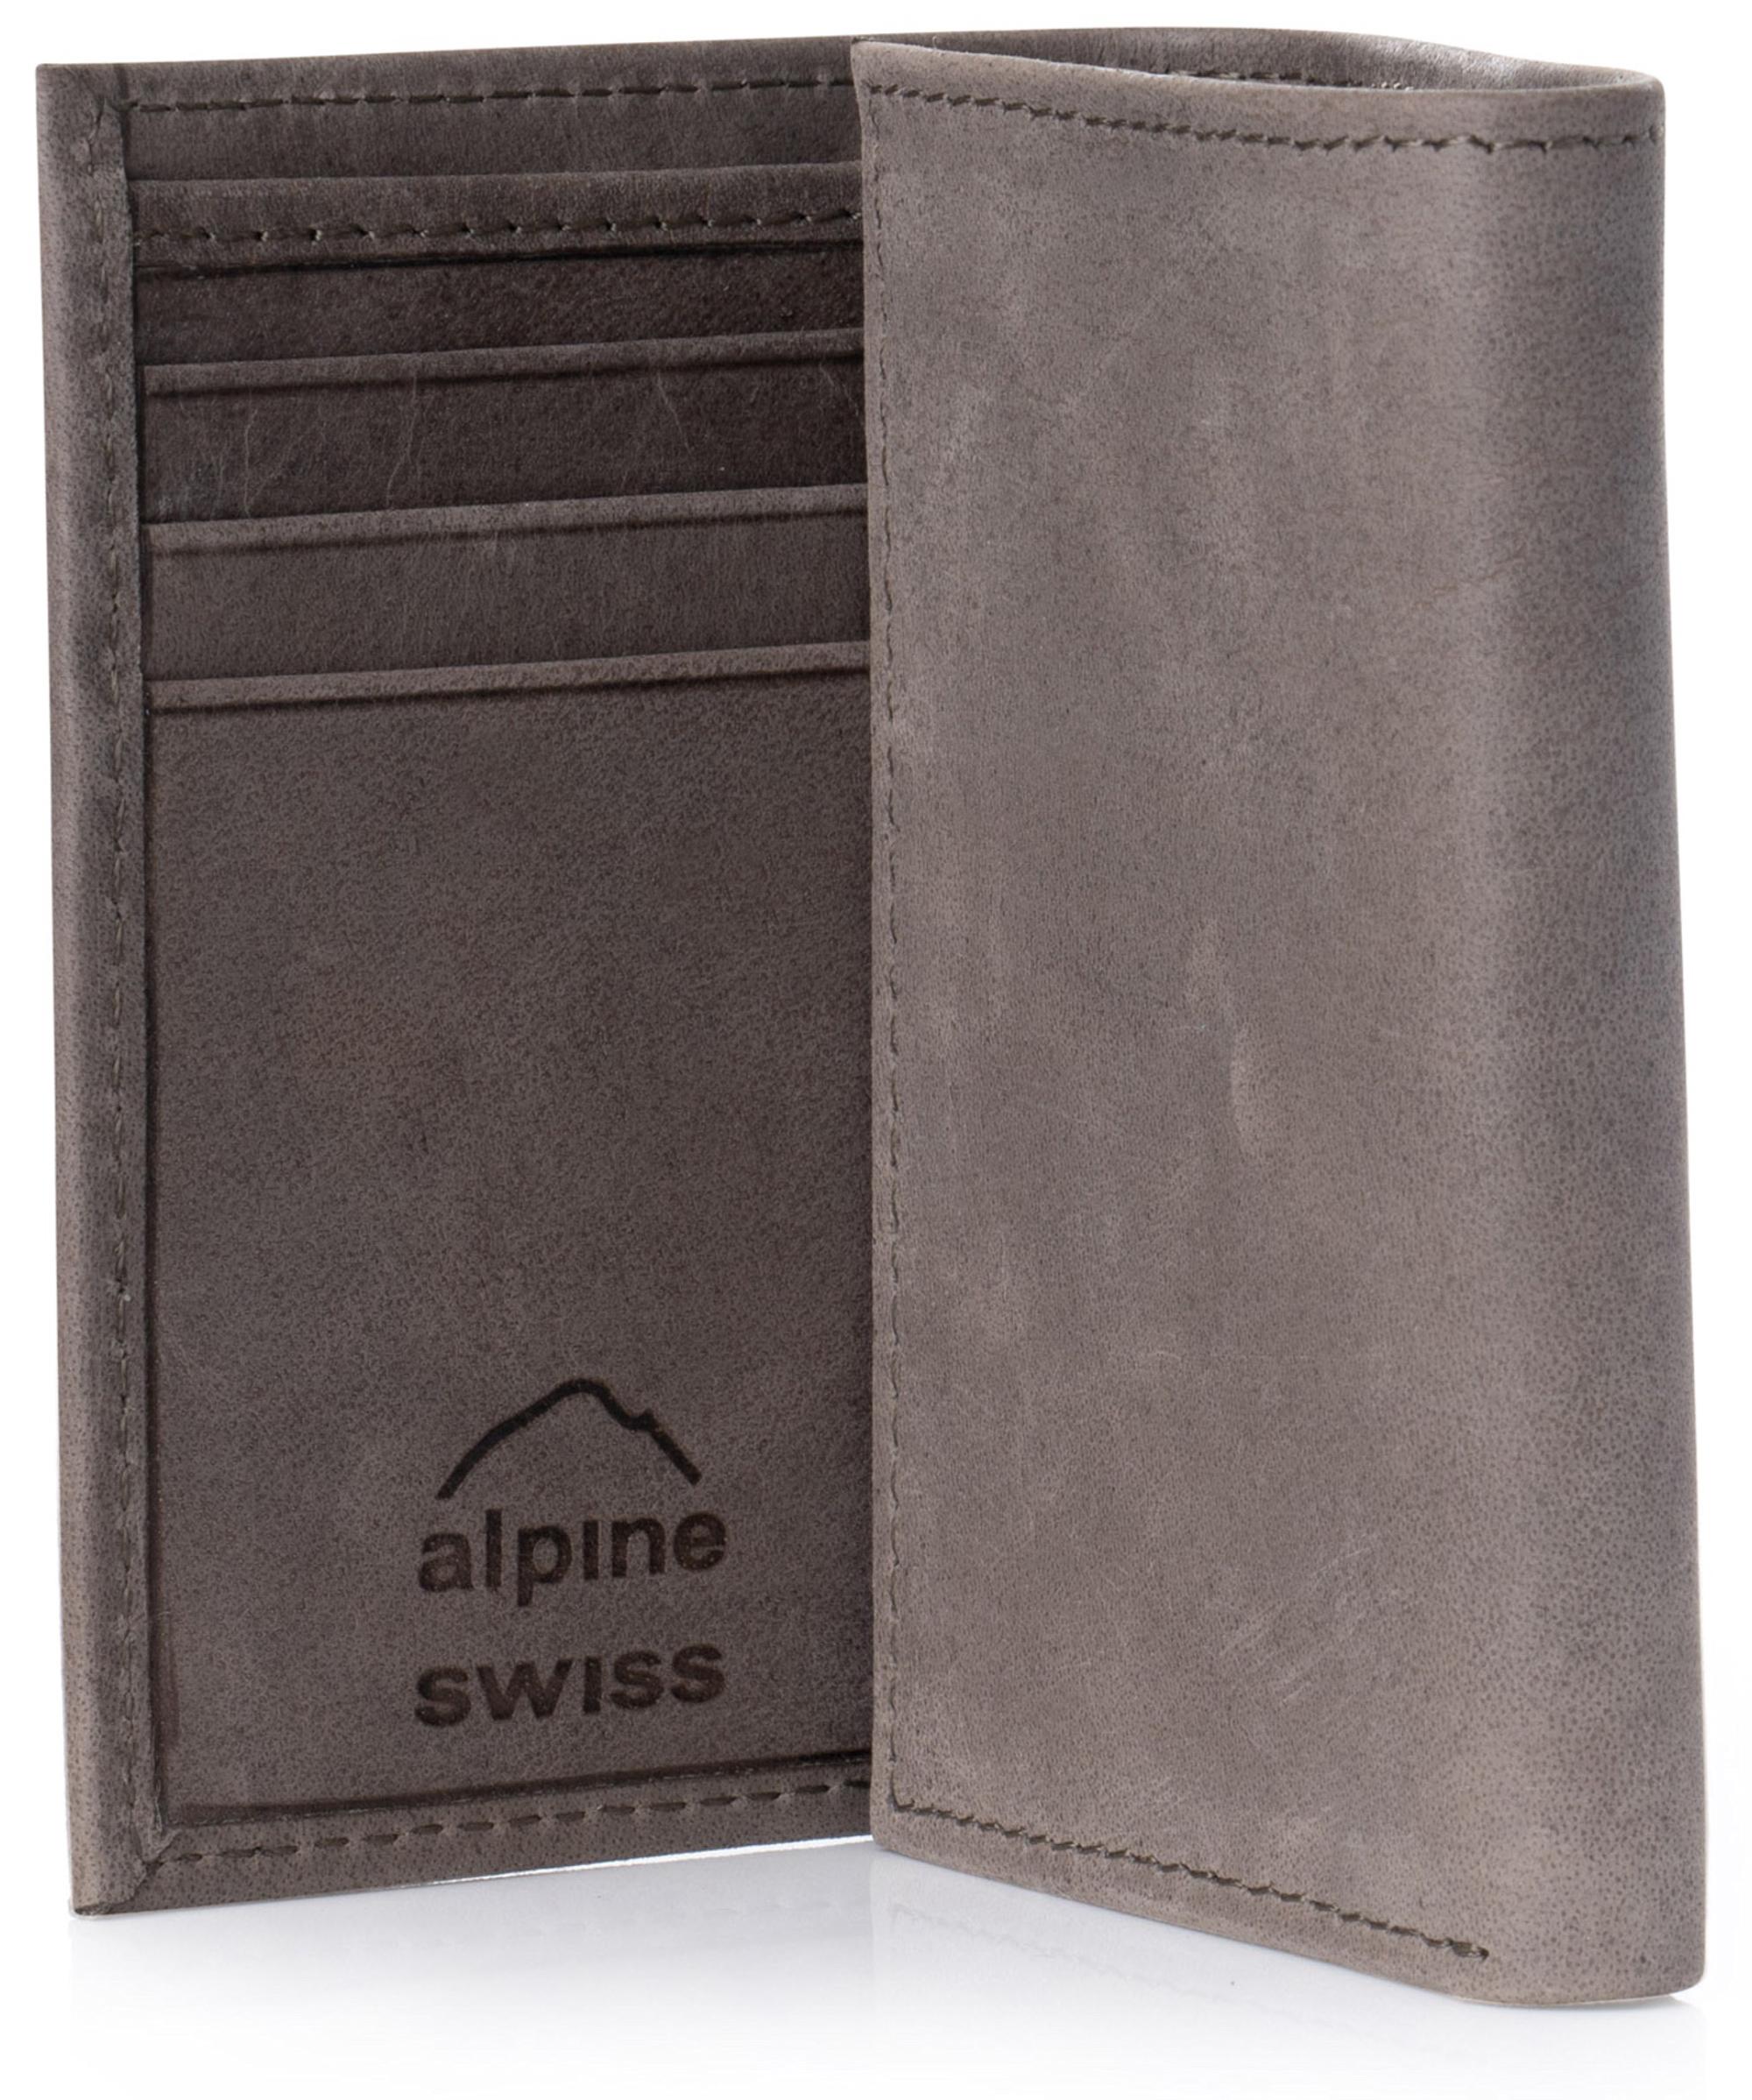 Alpine Swiss Mens Trifold Wallet Genuine Leather Card Case ID Window Billfold NW